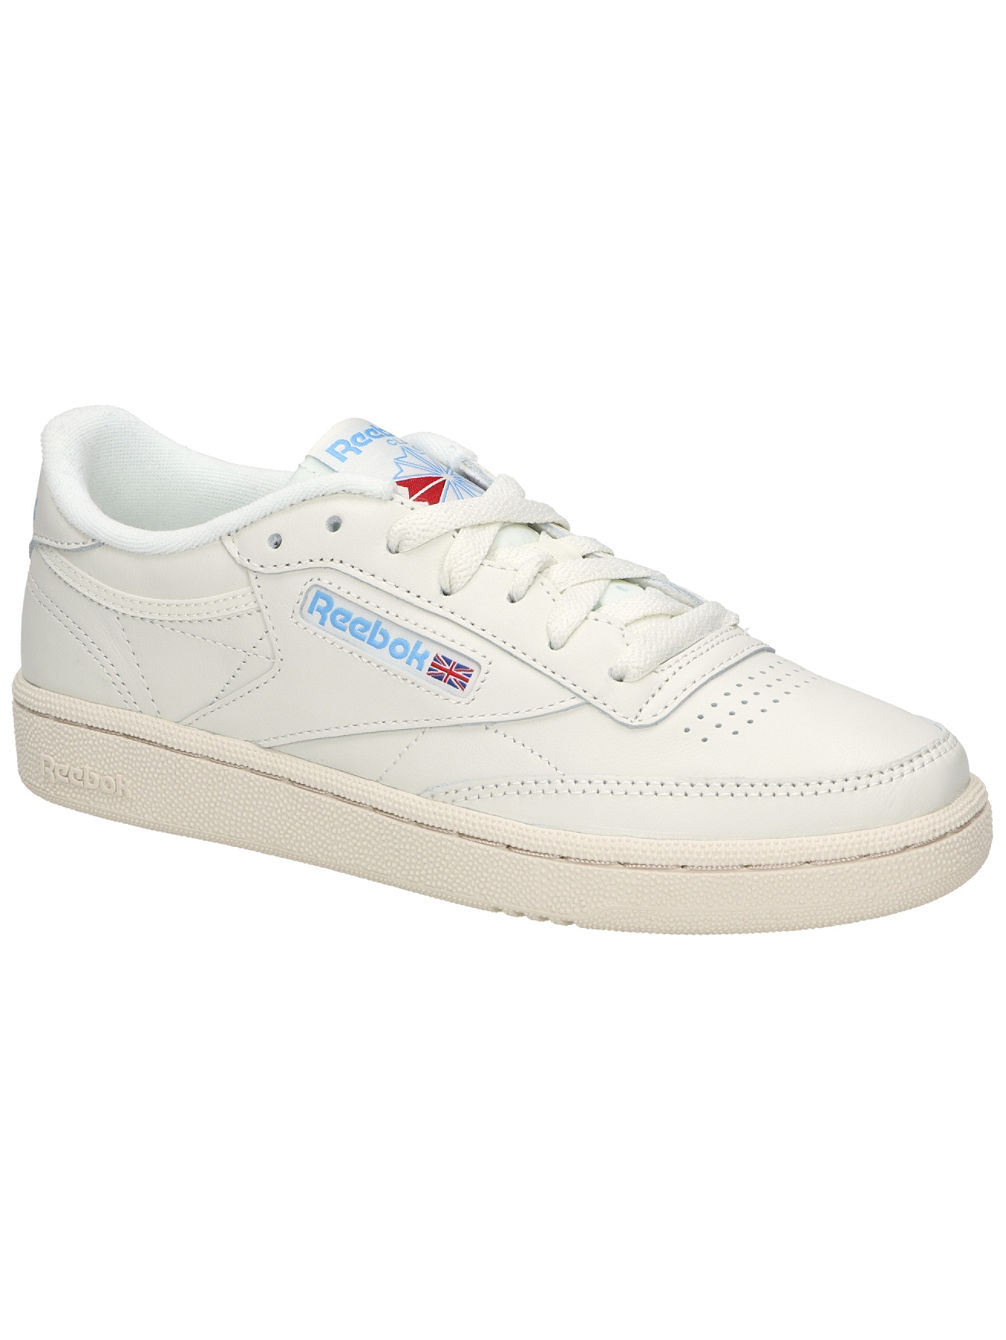 Buy Reebok Club C 85 Sneakers online at blue-tomato.com ff746bb6b